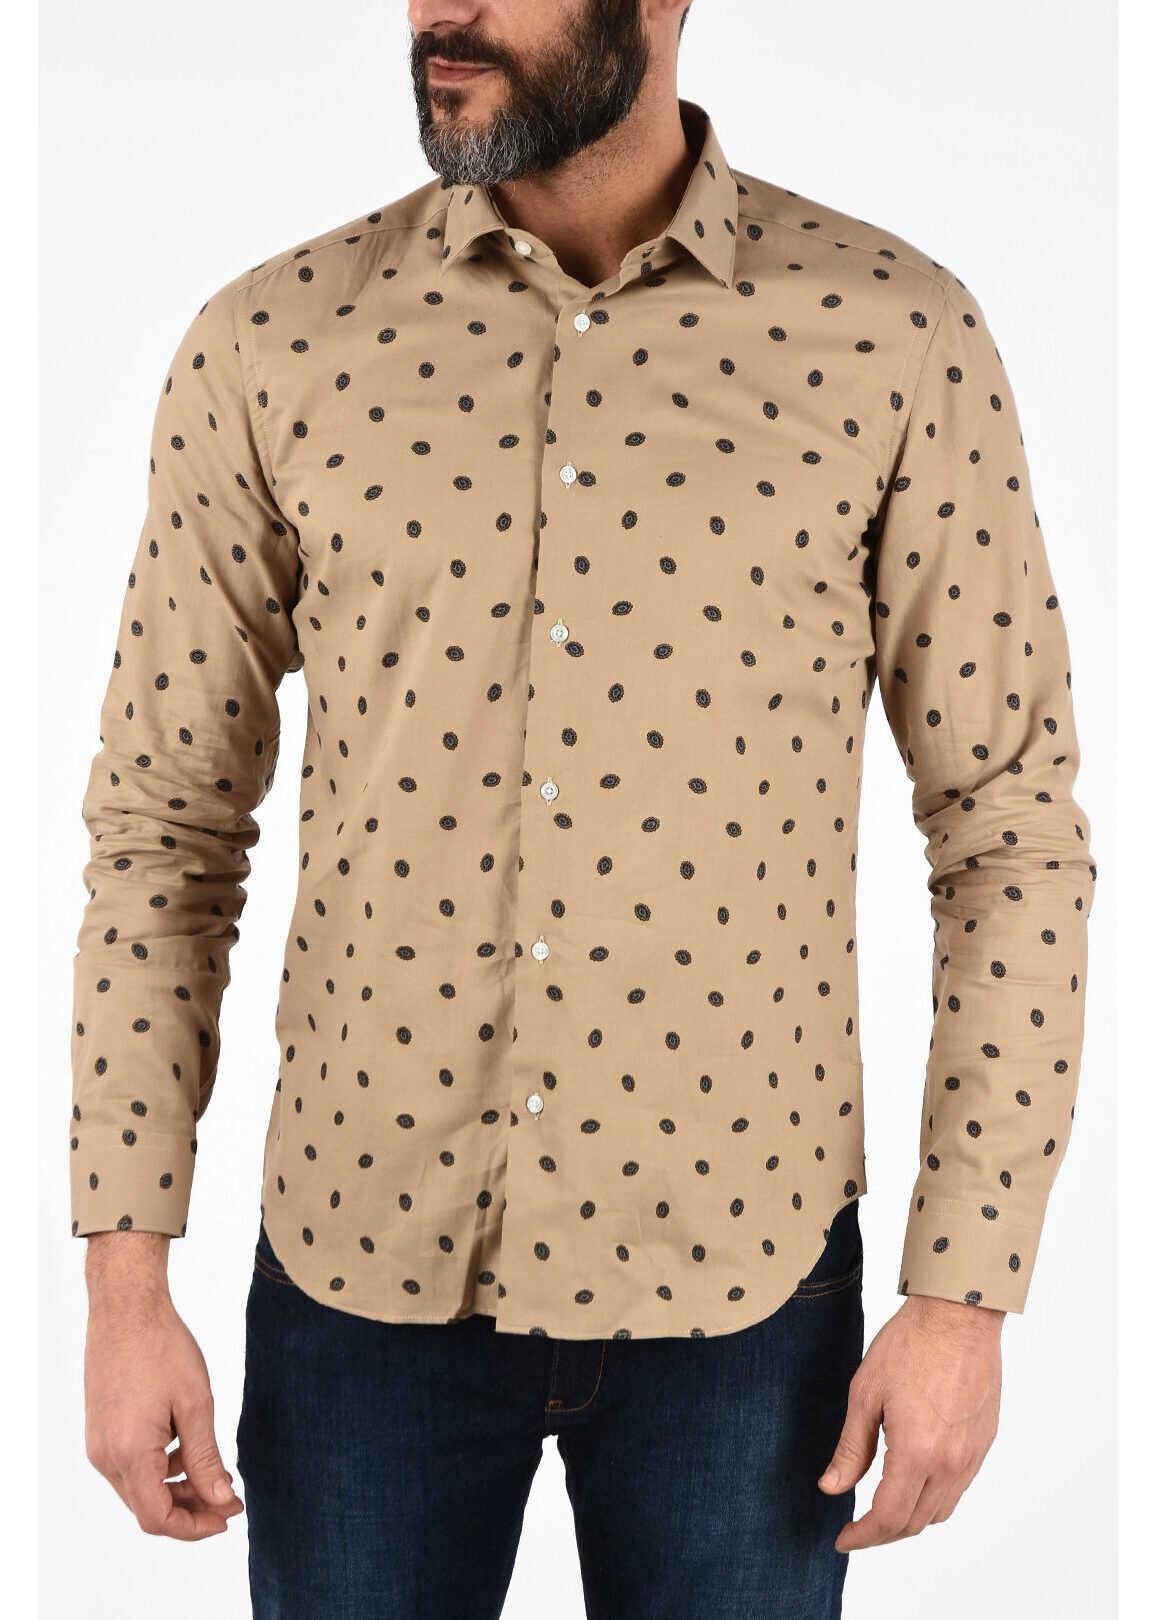 CORNELIANI CC COLLECTION printed SLIM spread collar shirt BEIGE imagine